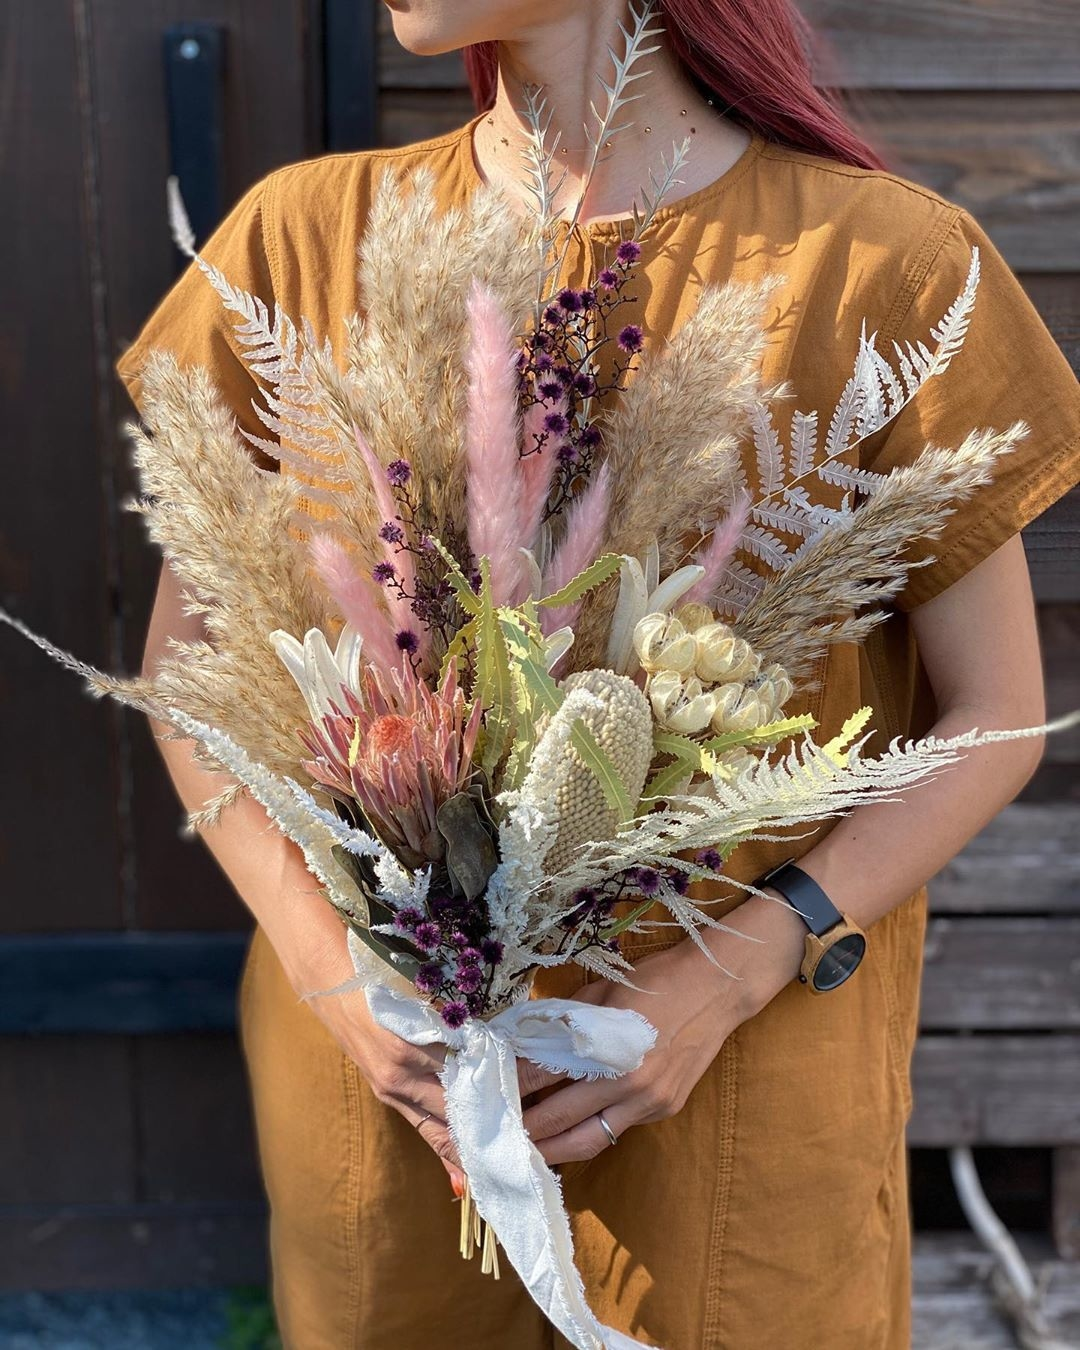 Case4:「花束」としてプレゼント